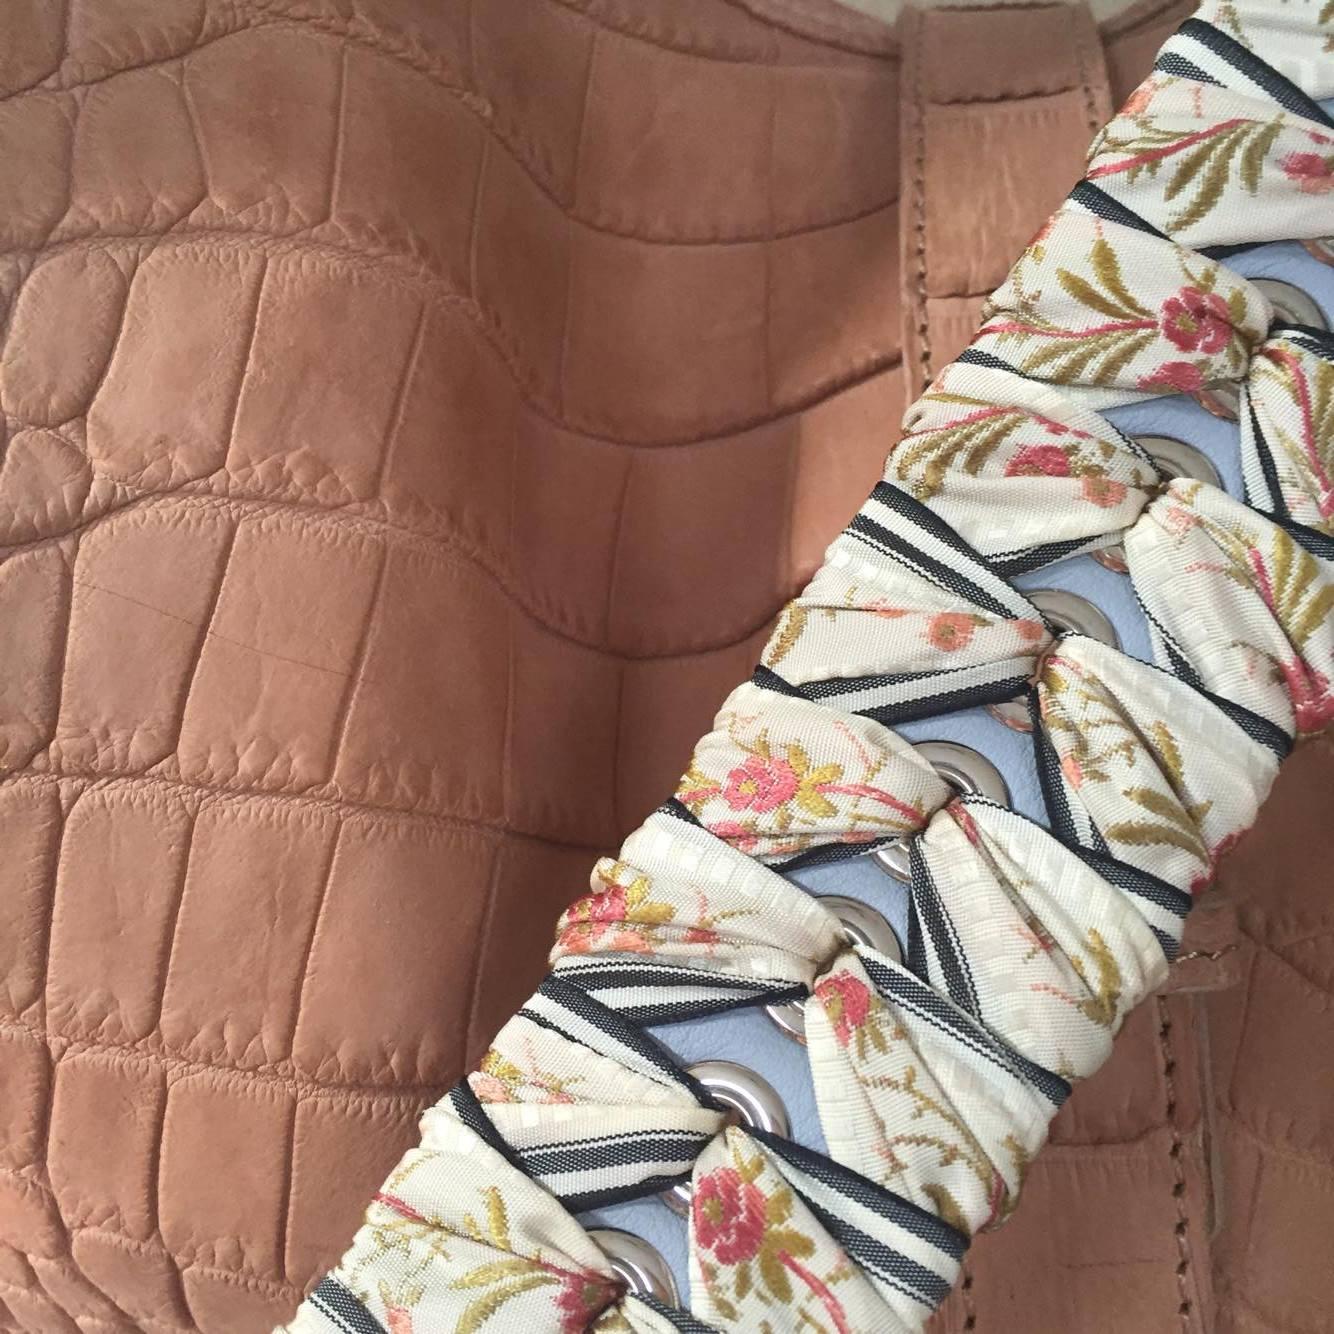 An ultra rare KAC with a Fendi strap.